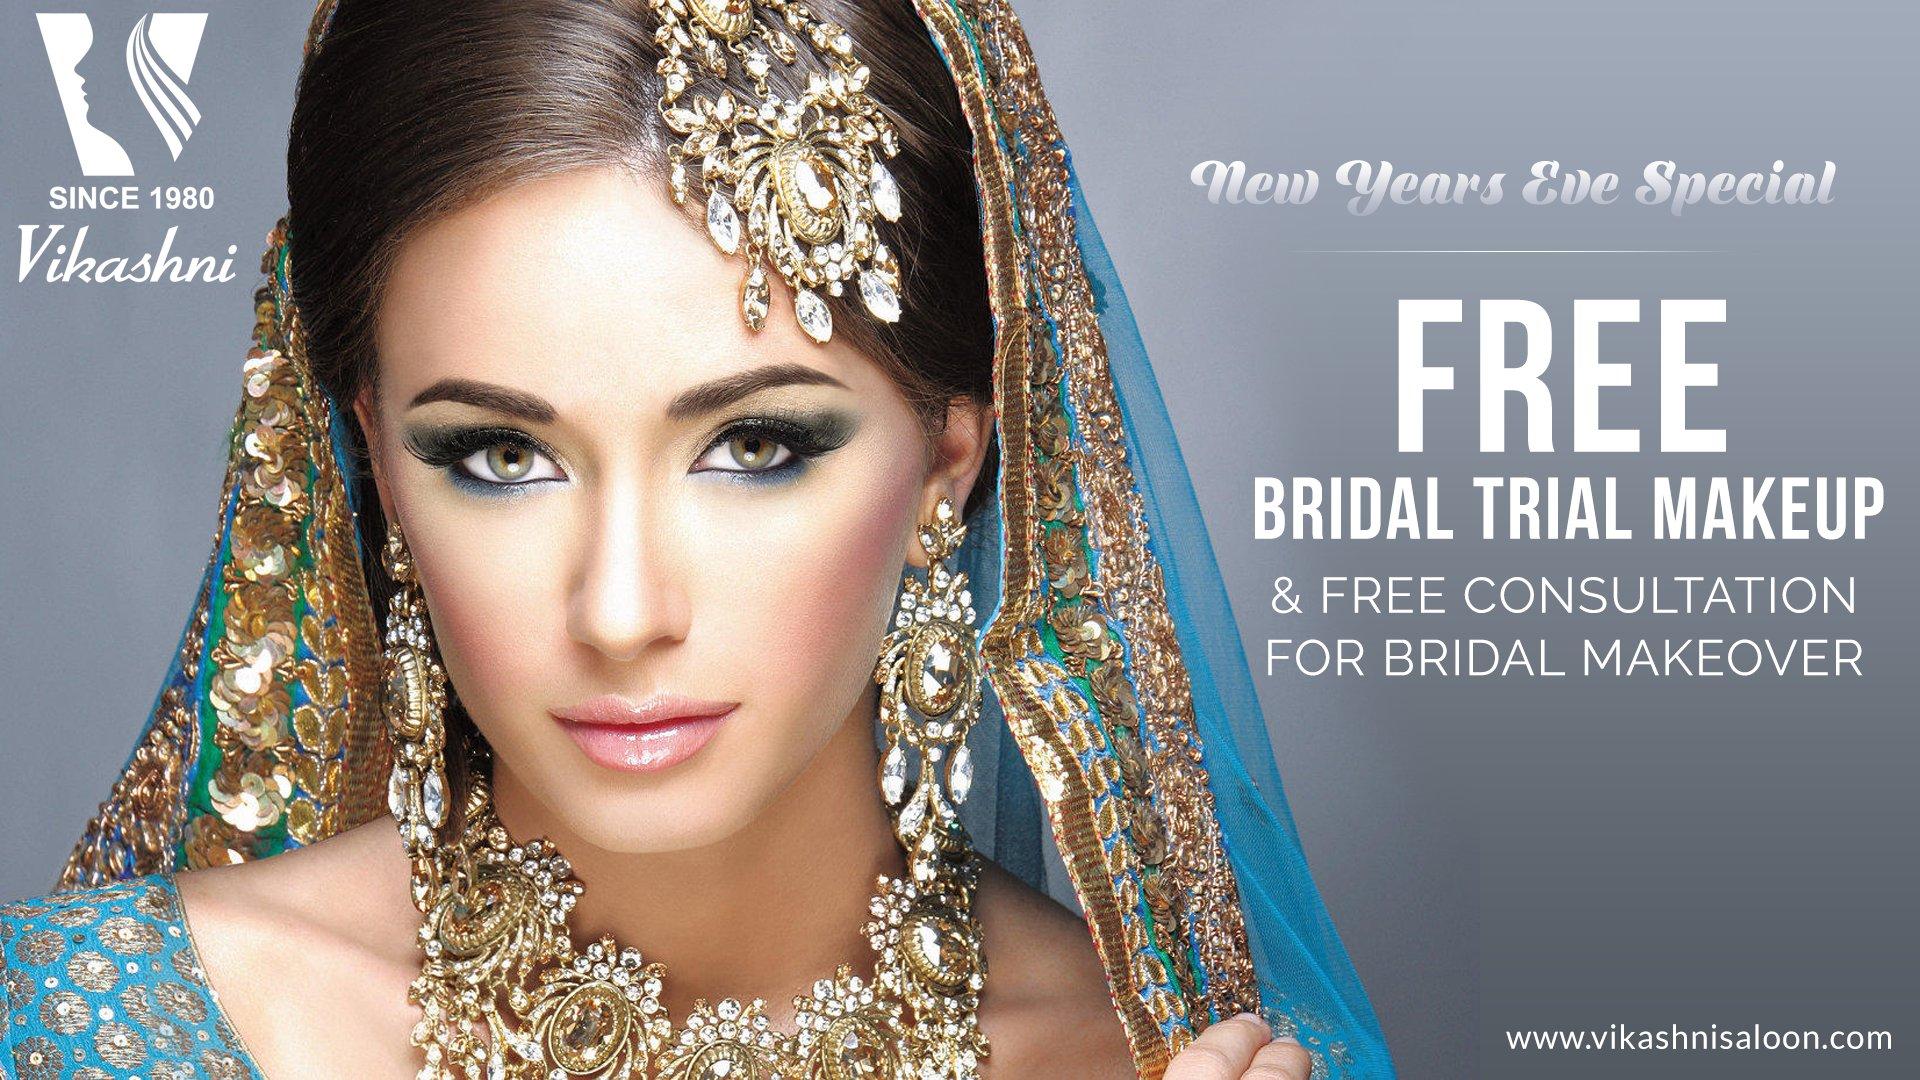 Vikashni Beauty Salon A Twitter New